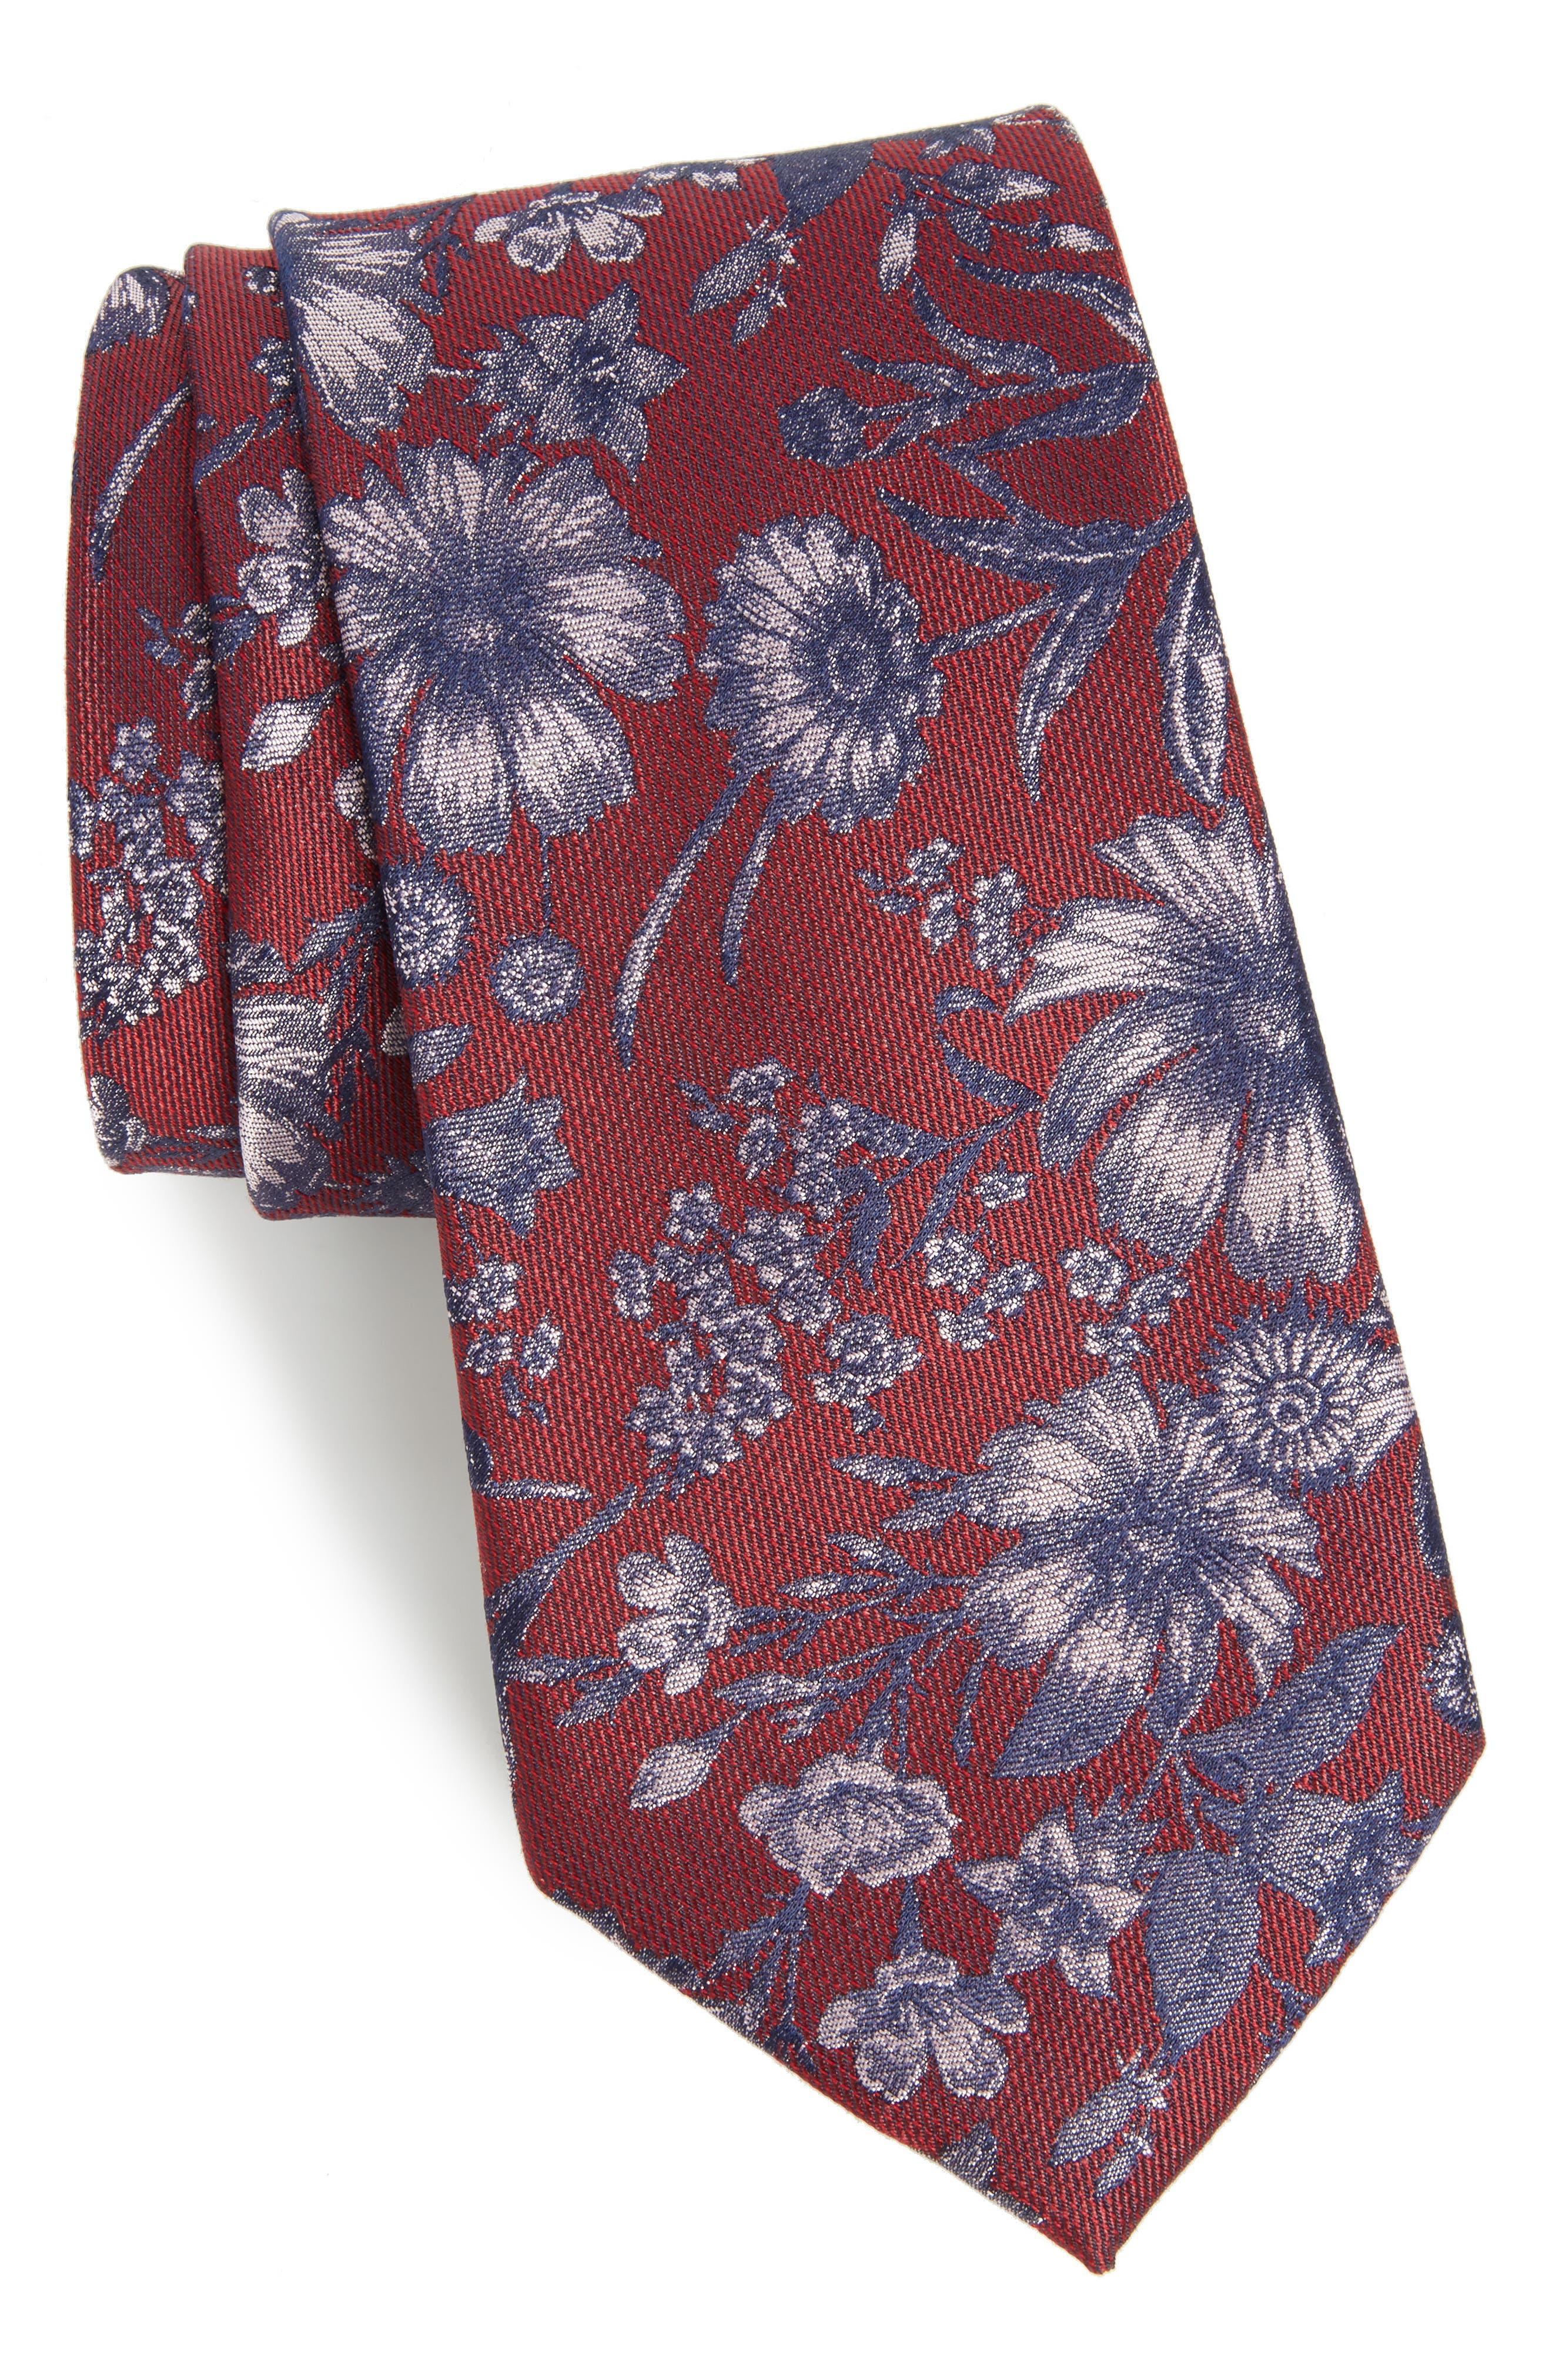 Alternate Image 1 Selected - Calibrate Fletcher Floral Print Silk & Cotton Tie